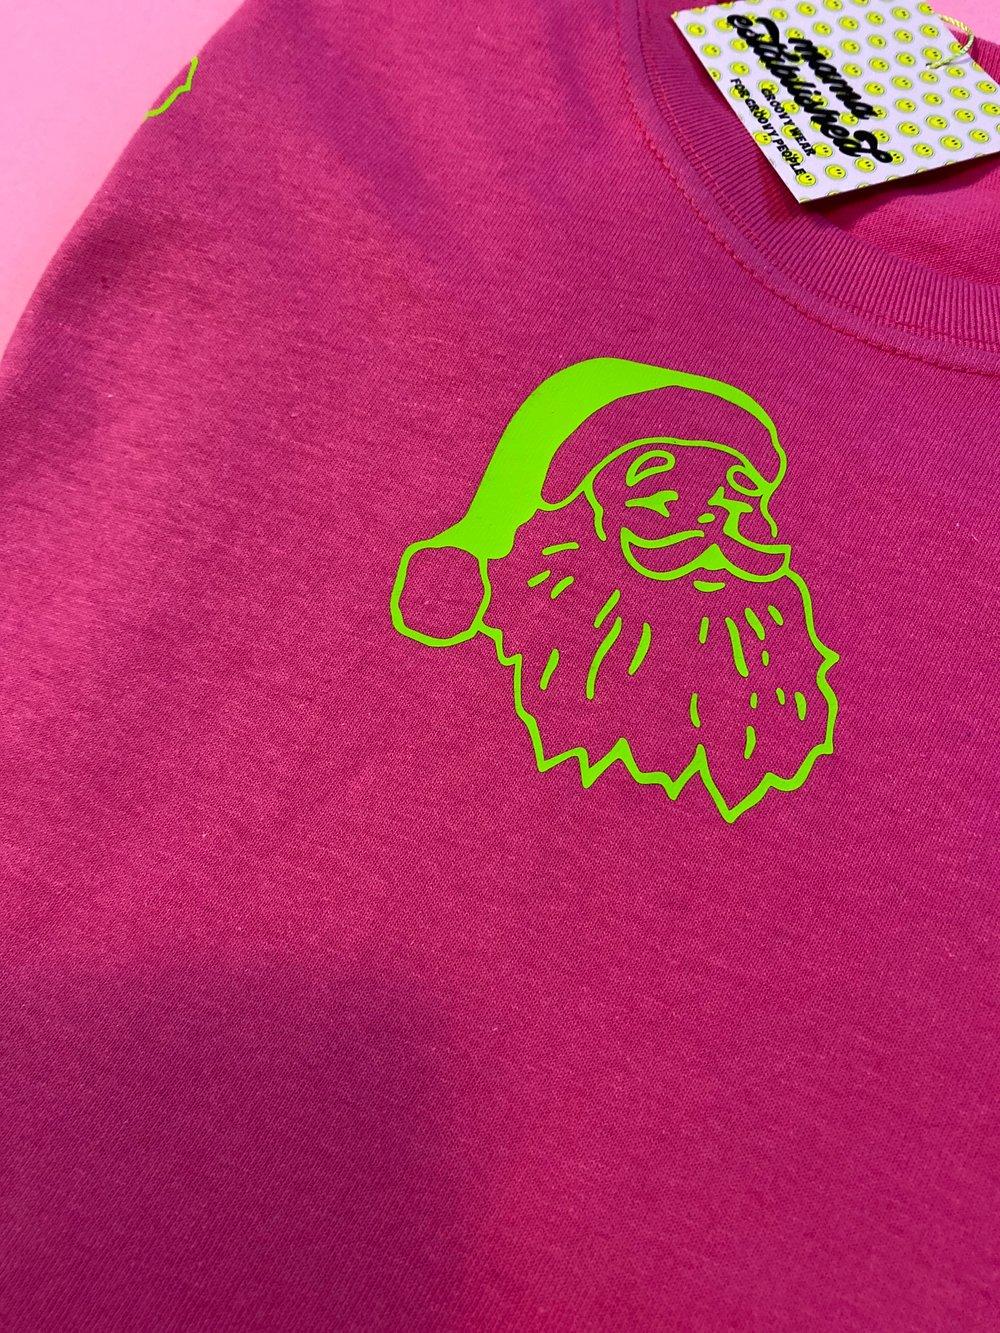 Image of Green Santa Tee or sweater